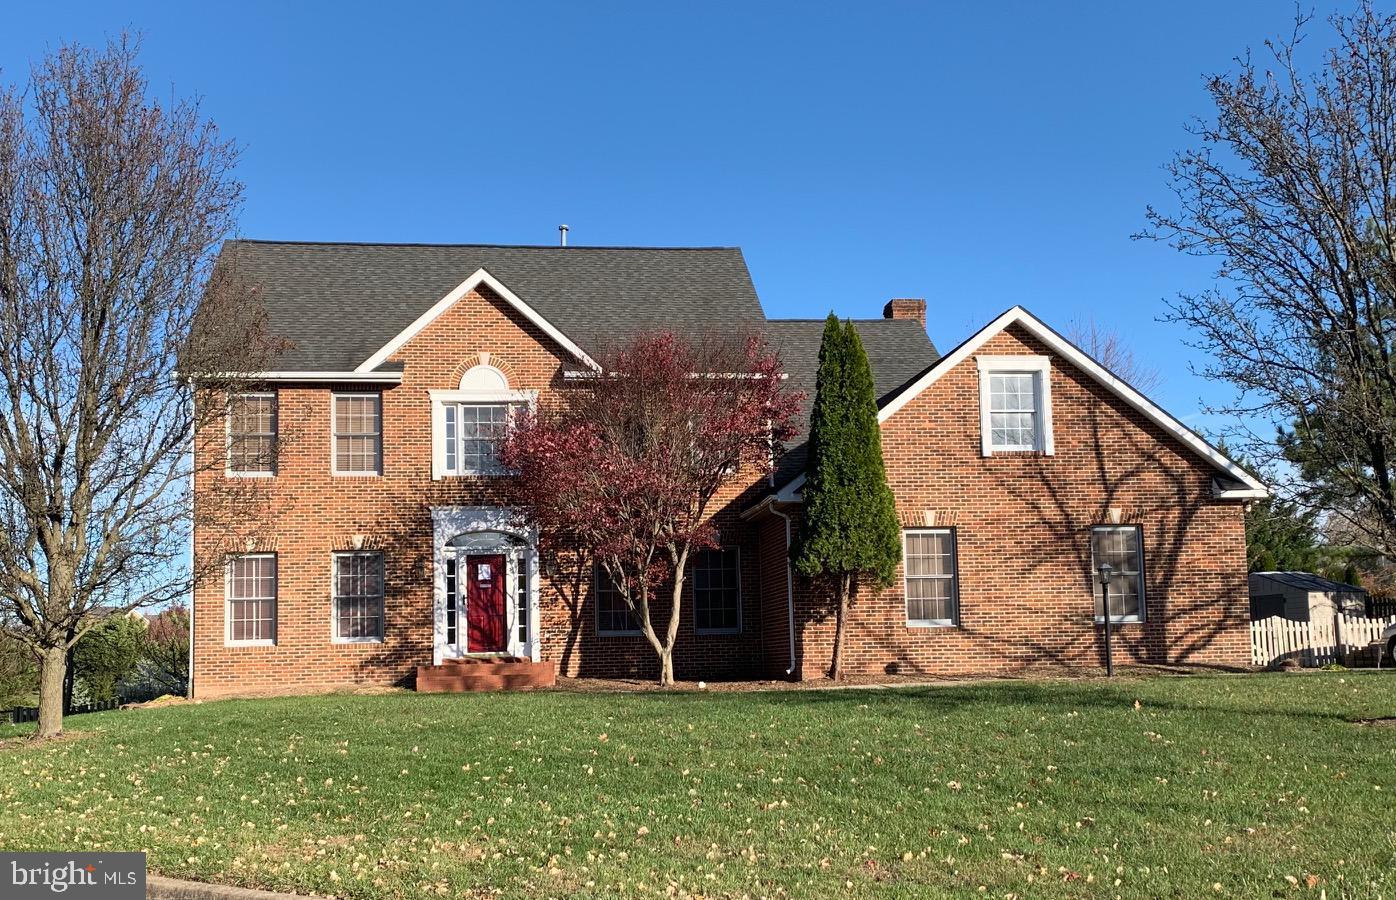 308 Huntersridge Rd, Winchester, VA, 22602